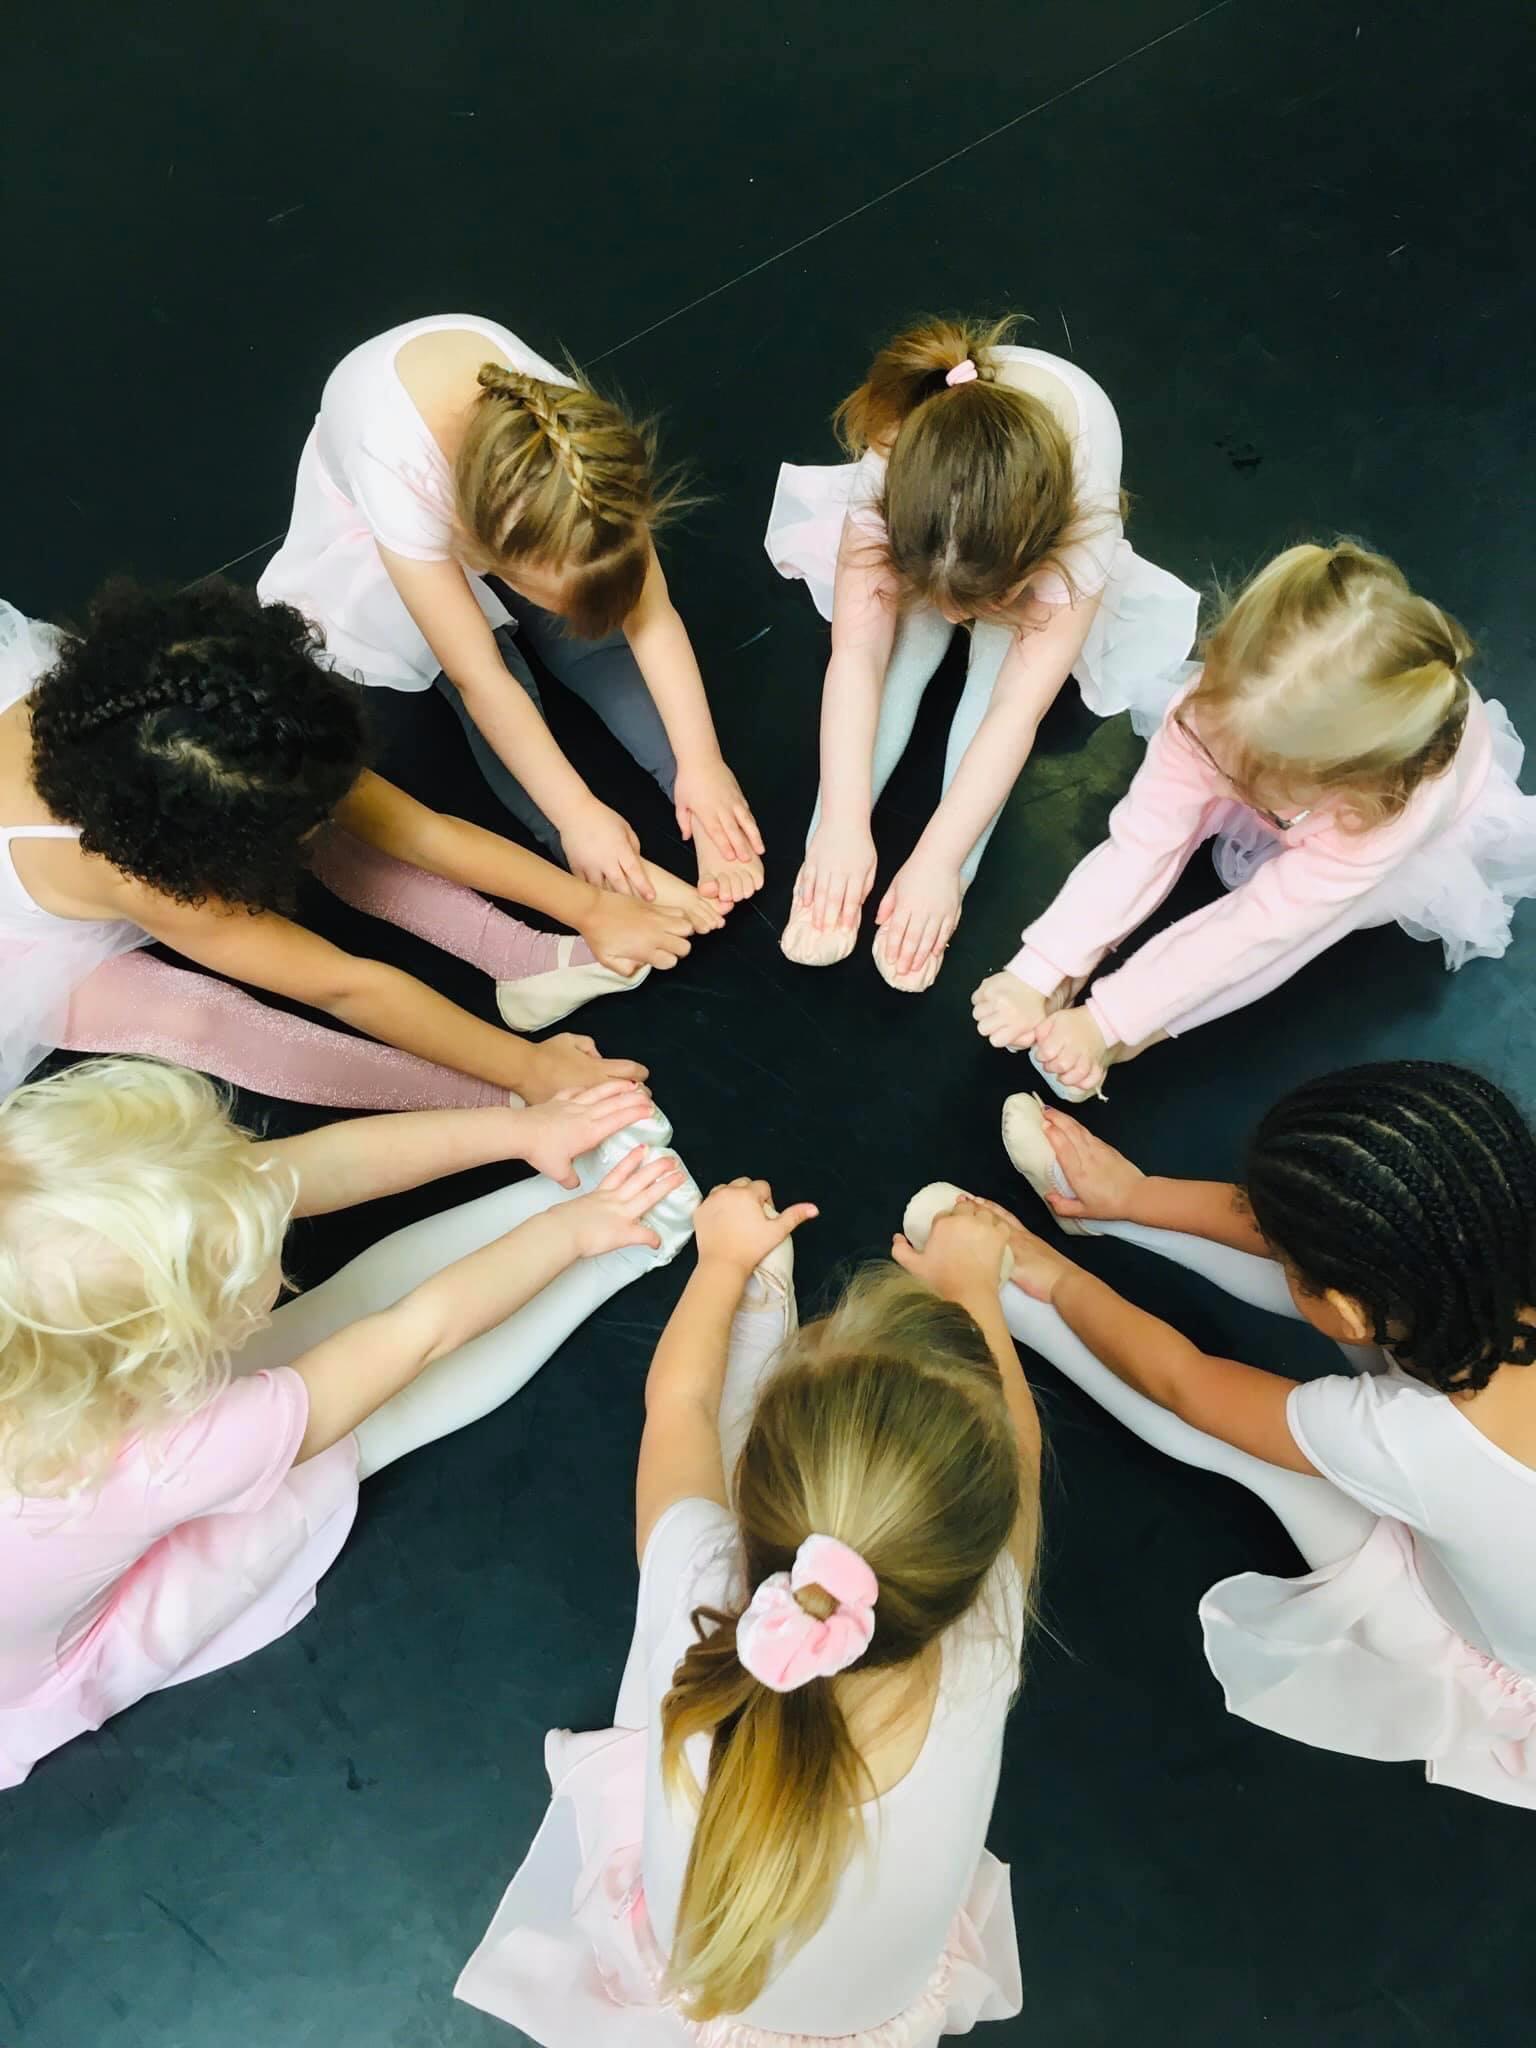 ballet class in a circle